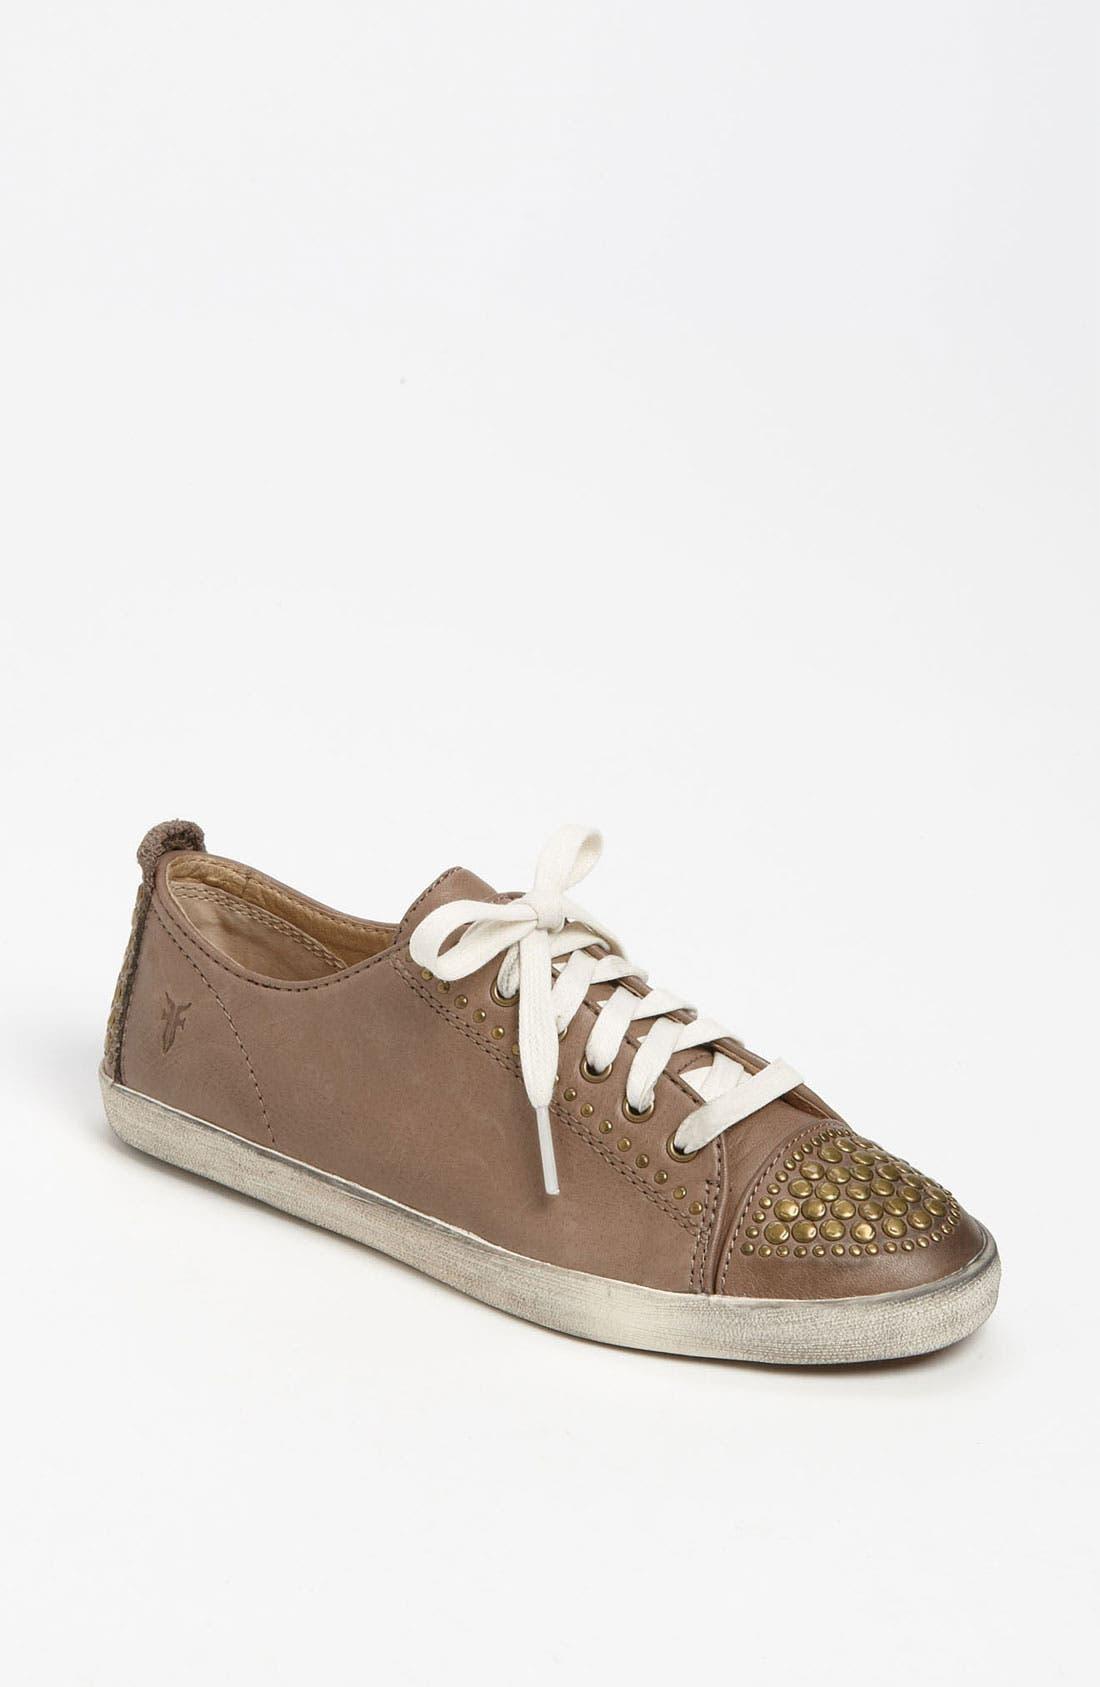 Alternate Image 1 Selected - Frye 'Kira' Sneaker